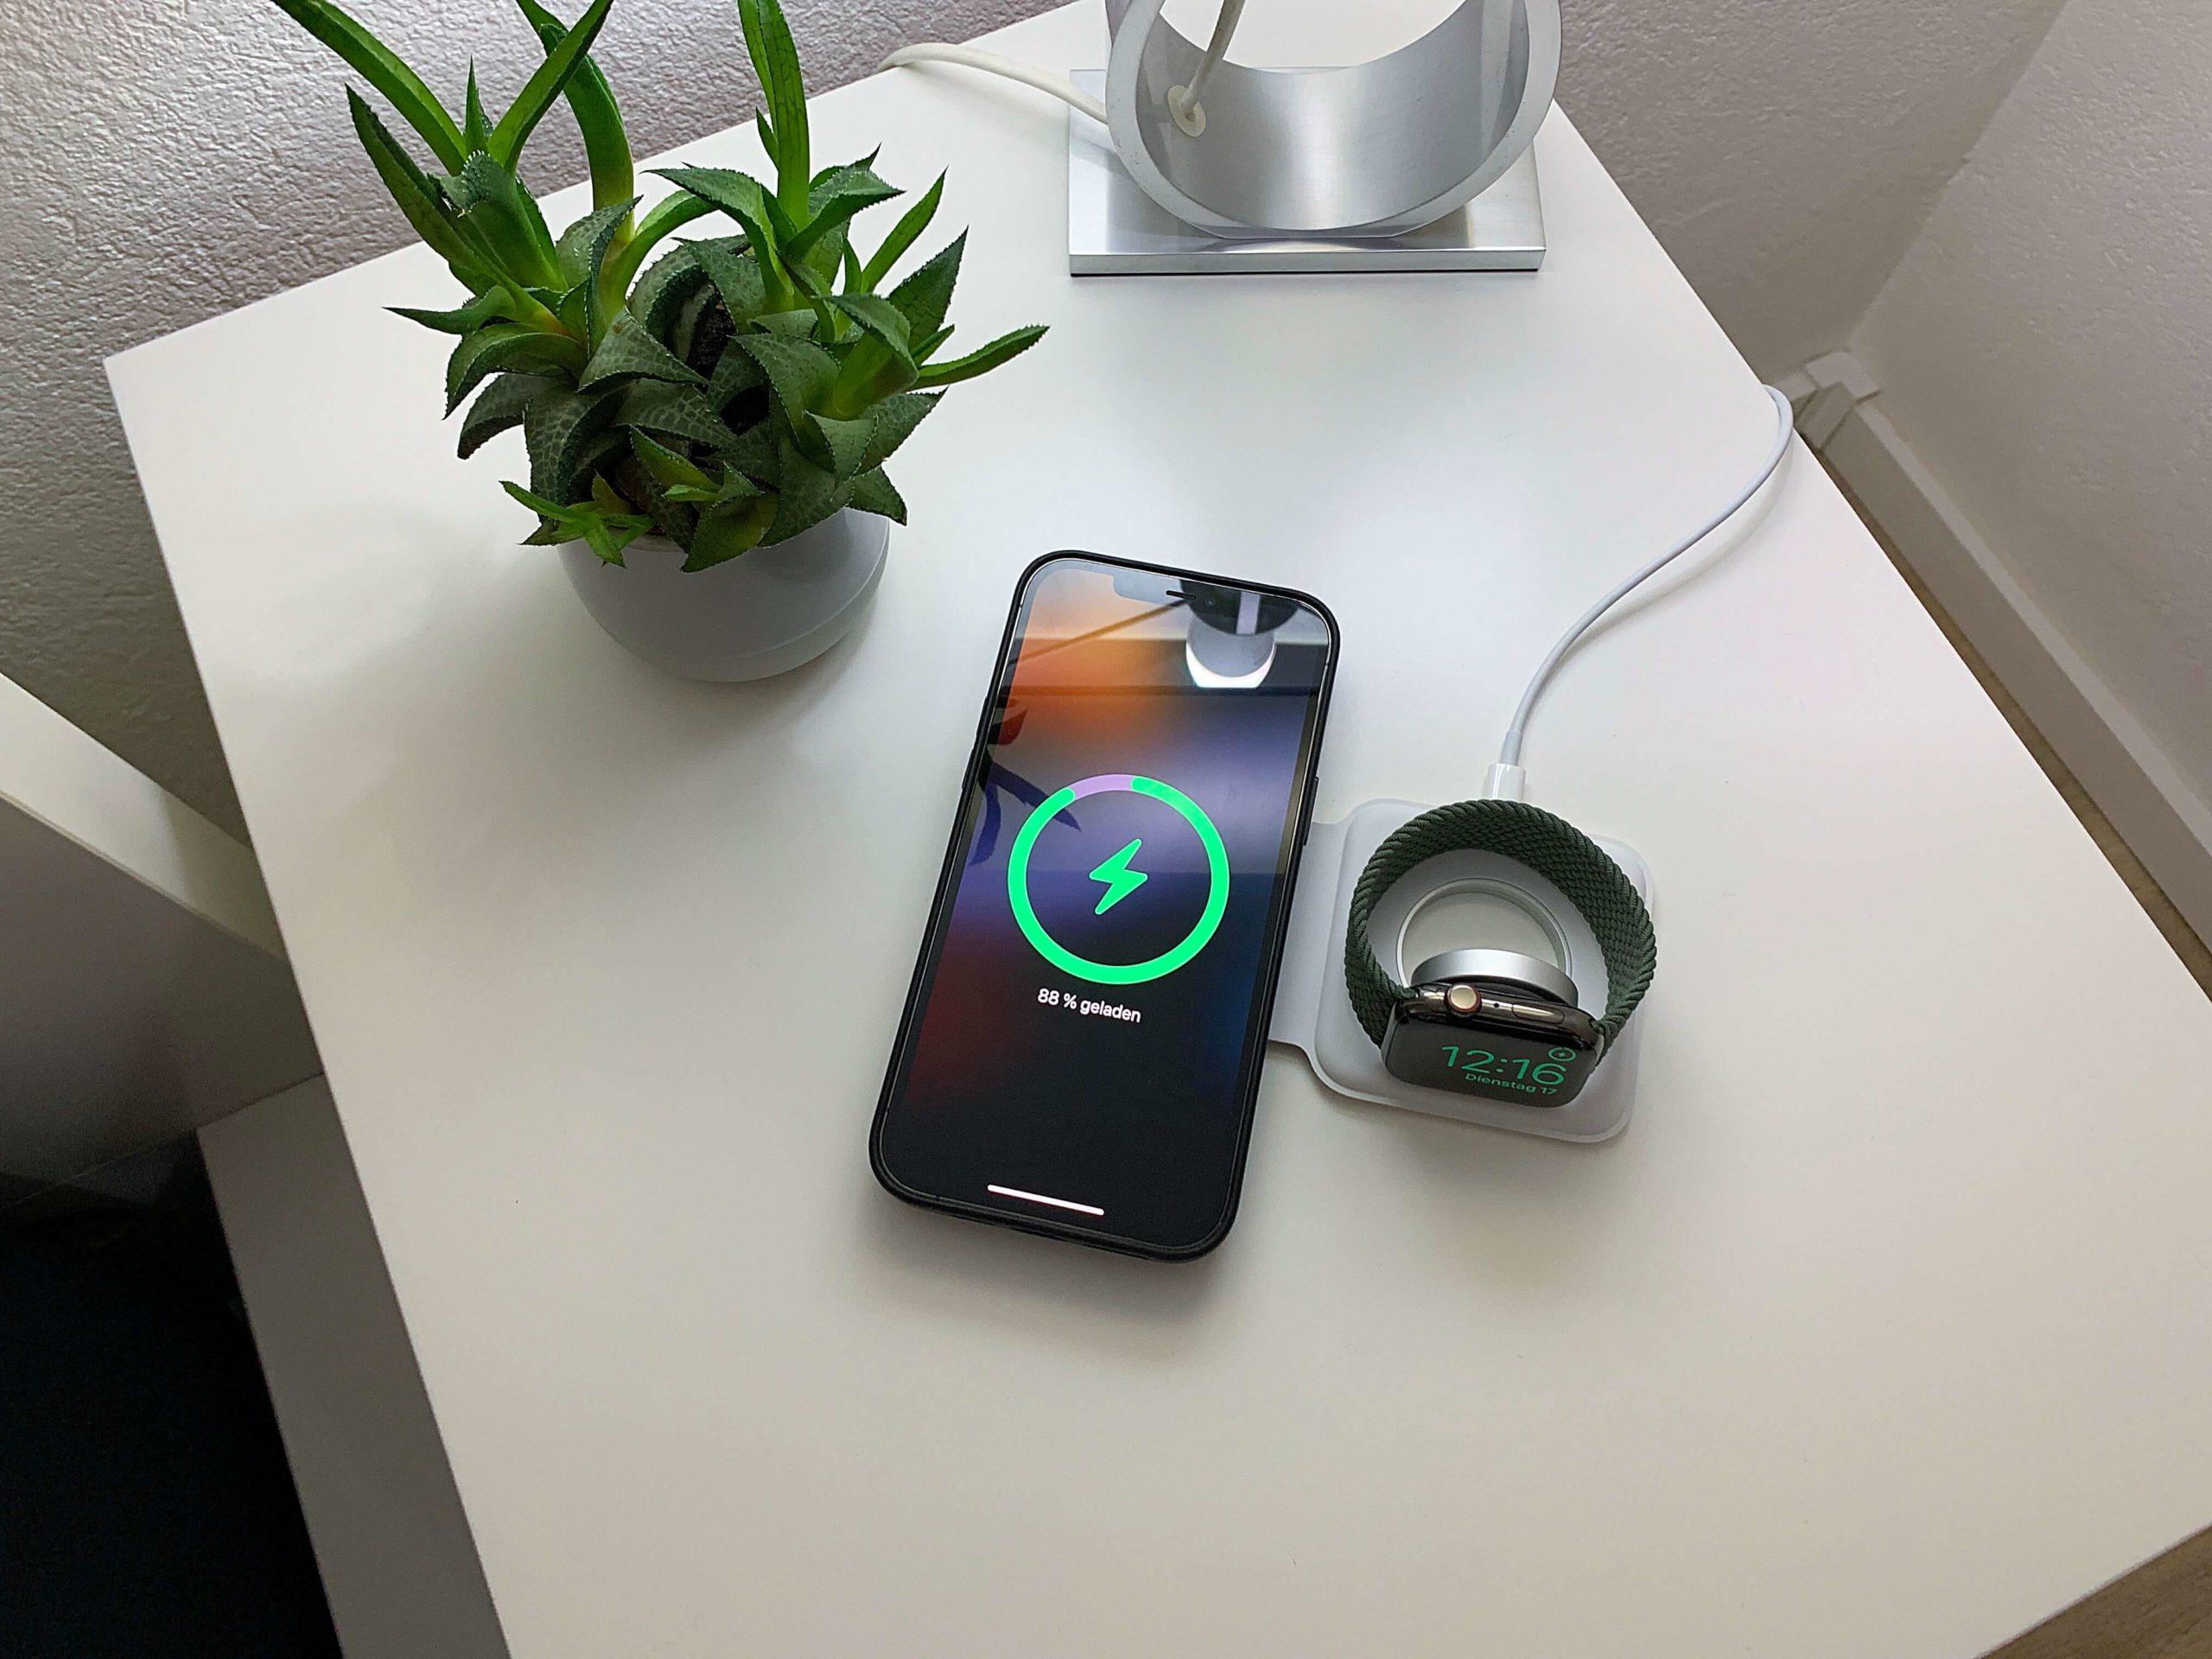 MagSafe-Duo-der-mobile-Ladeprofi7-scaled MagSafe Duo - der mobile Ladeprofi